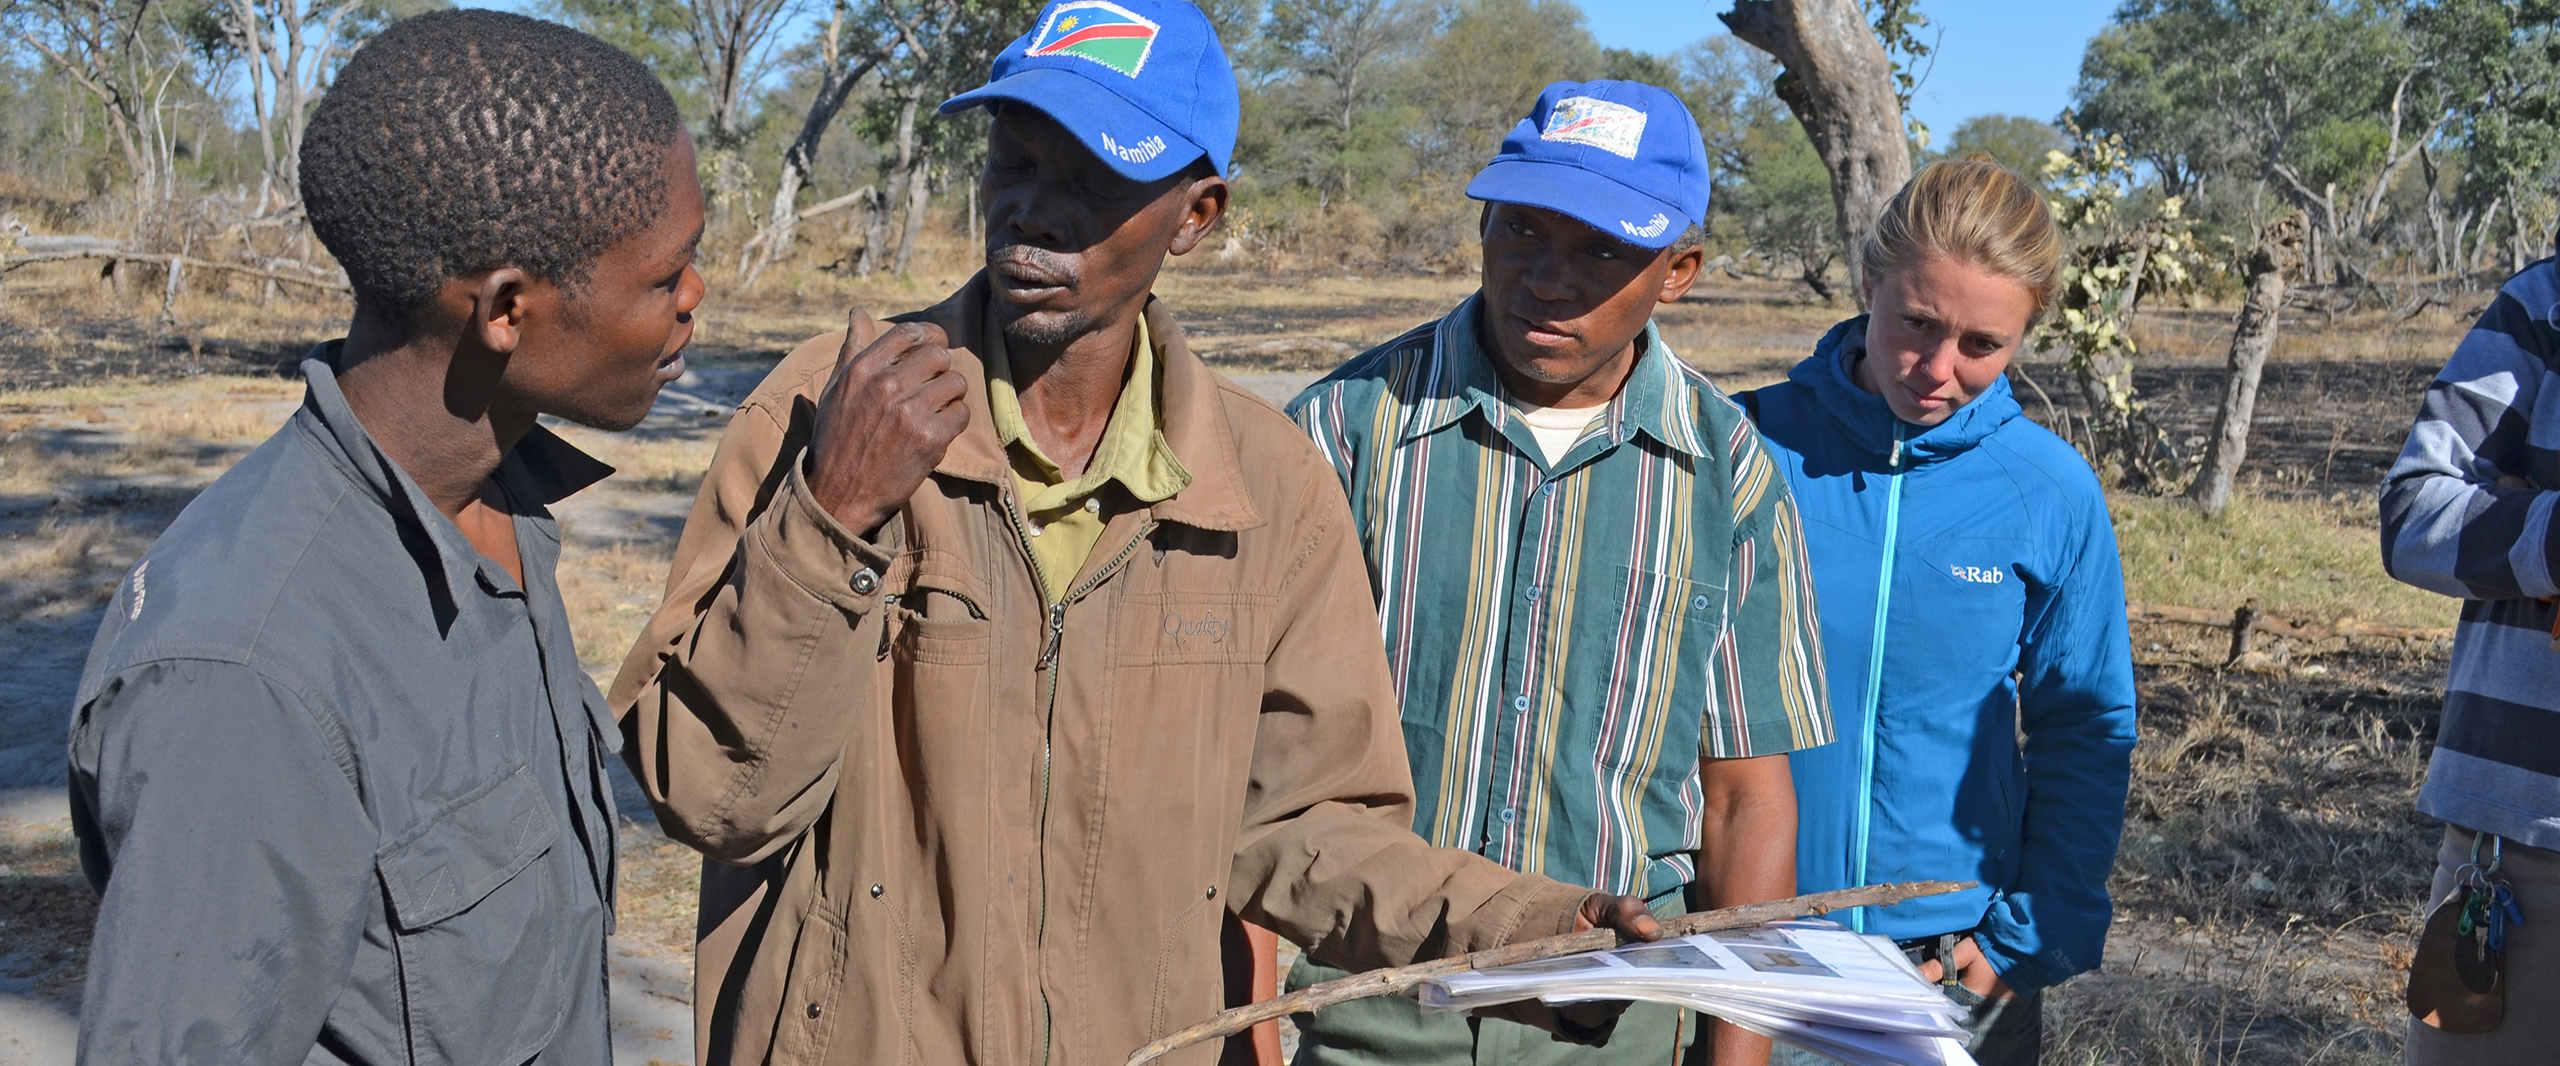 Guide gibt Auskunft ueber das Spurenleserprojekt der Khwe